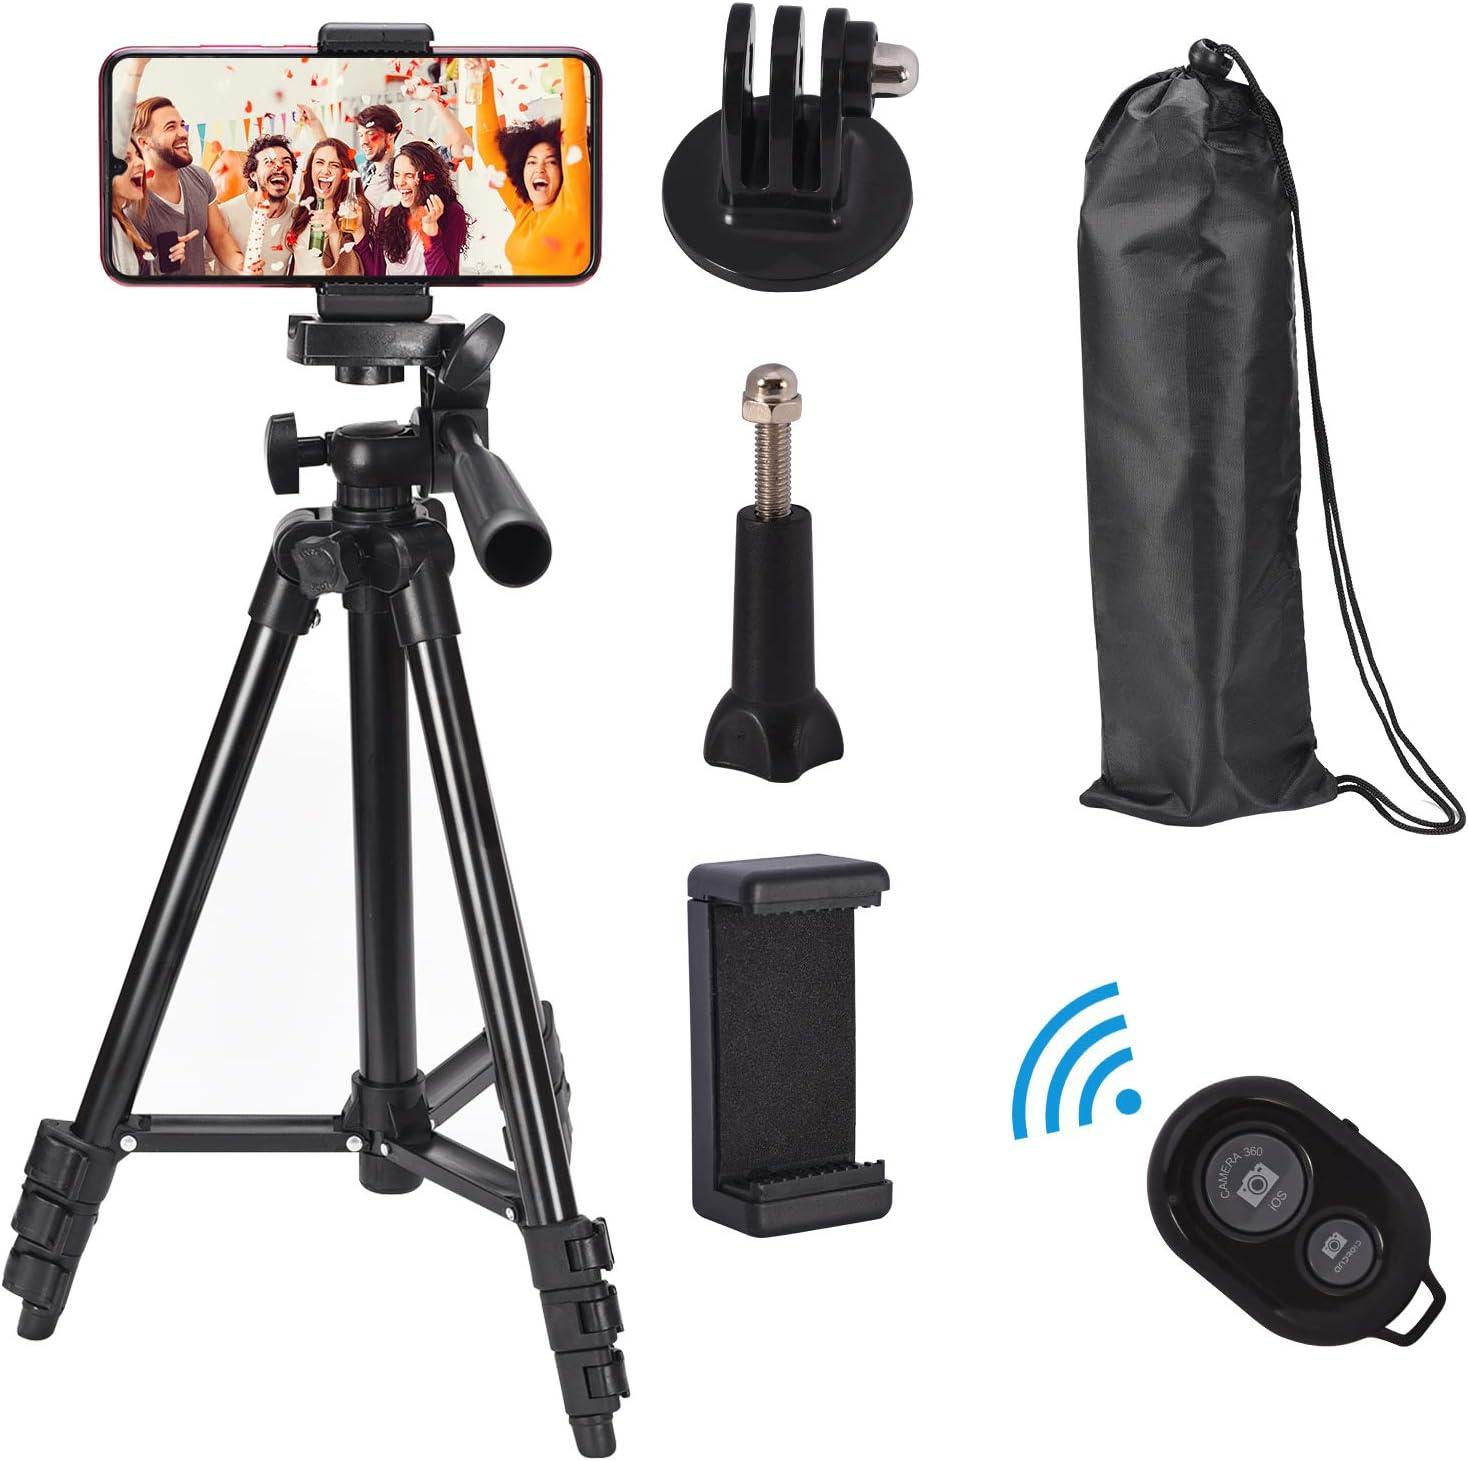 Lightweight Phone Tripod Al sold out. Popular brand 42 Inch Camera wi Aluminum Stand